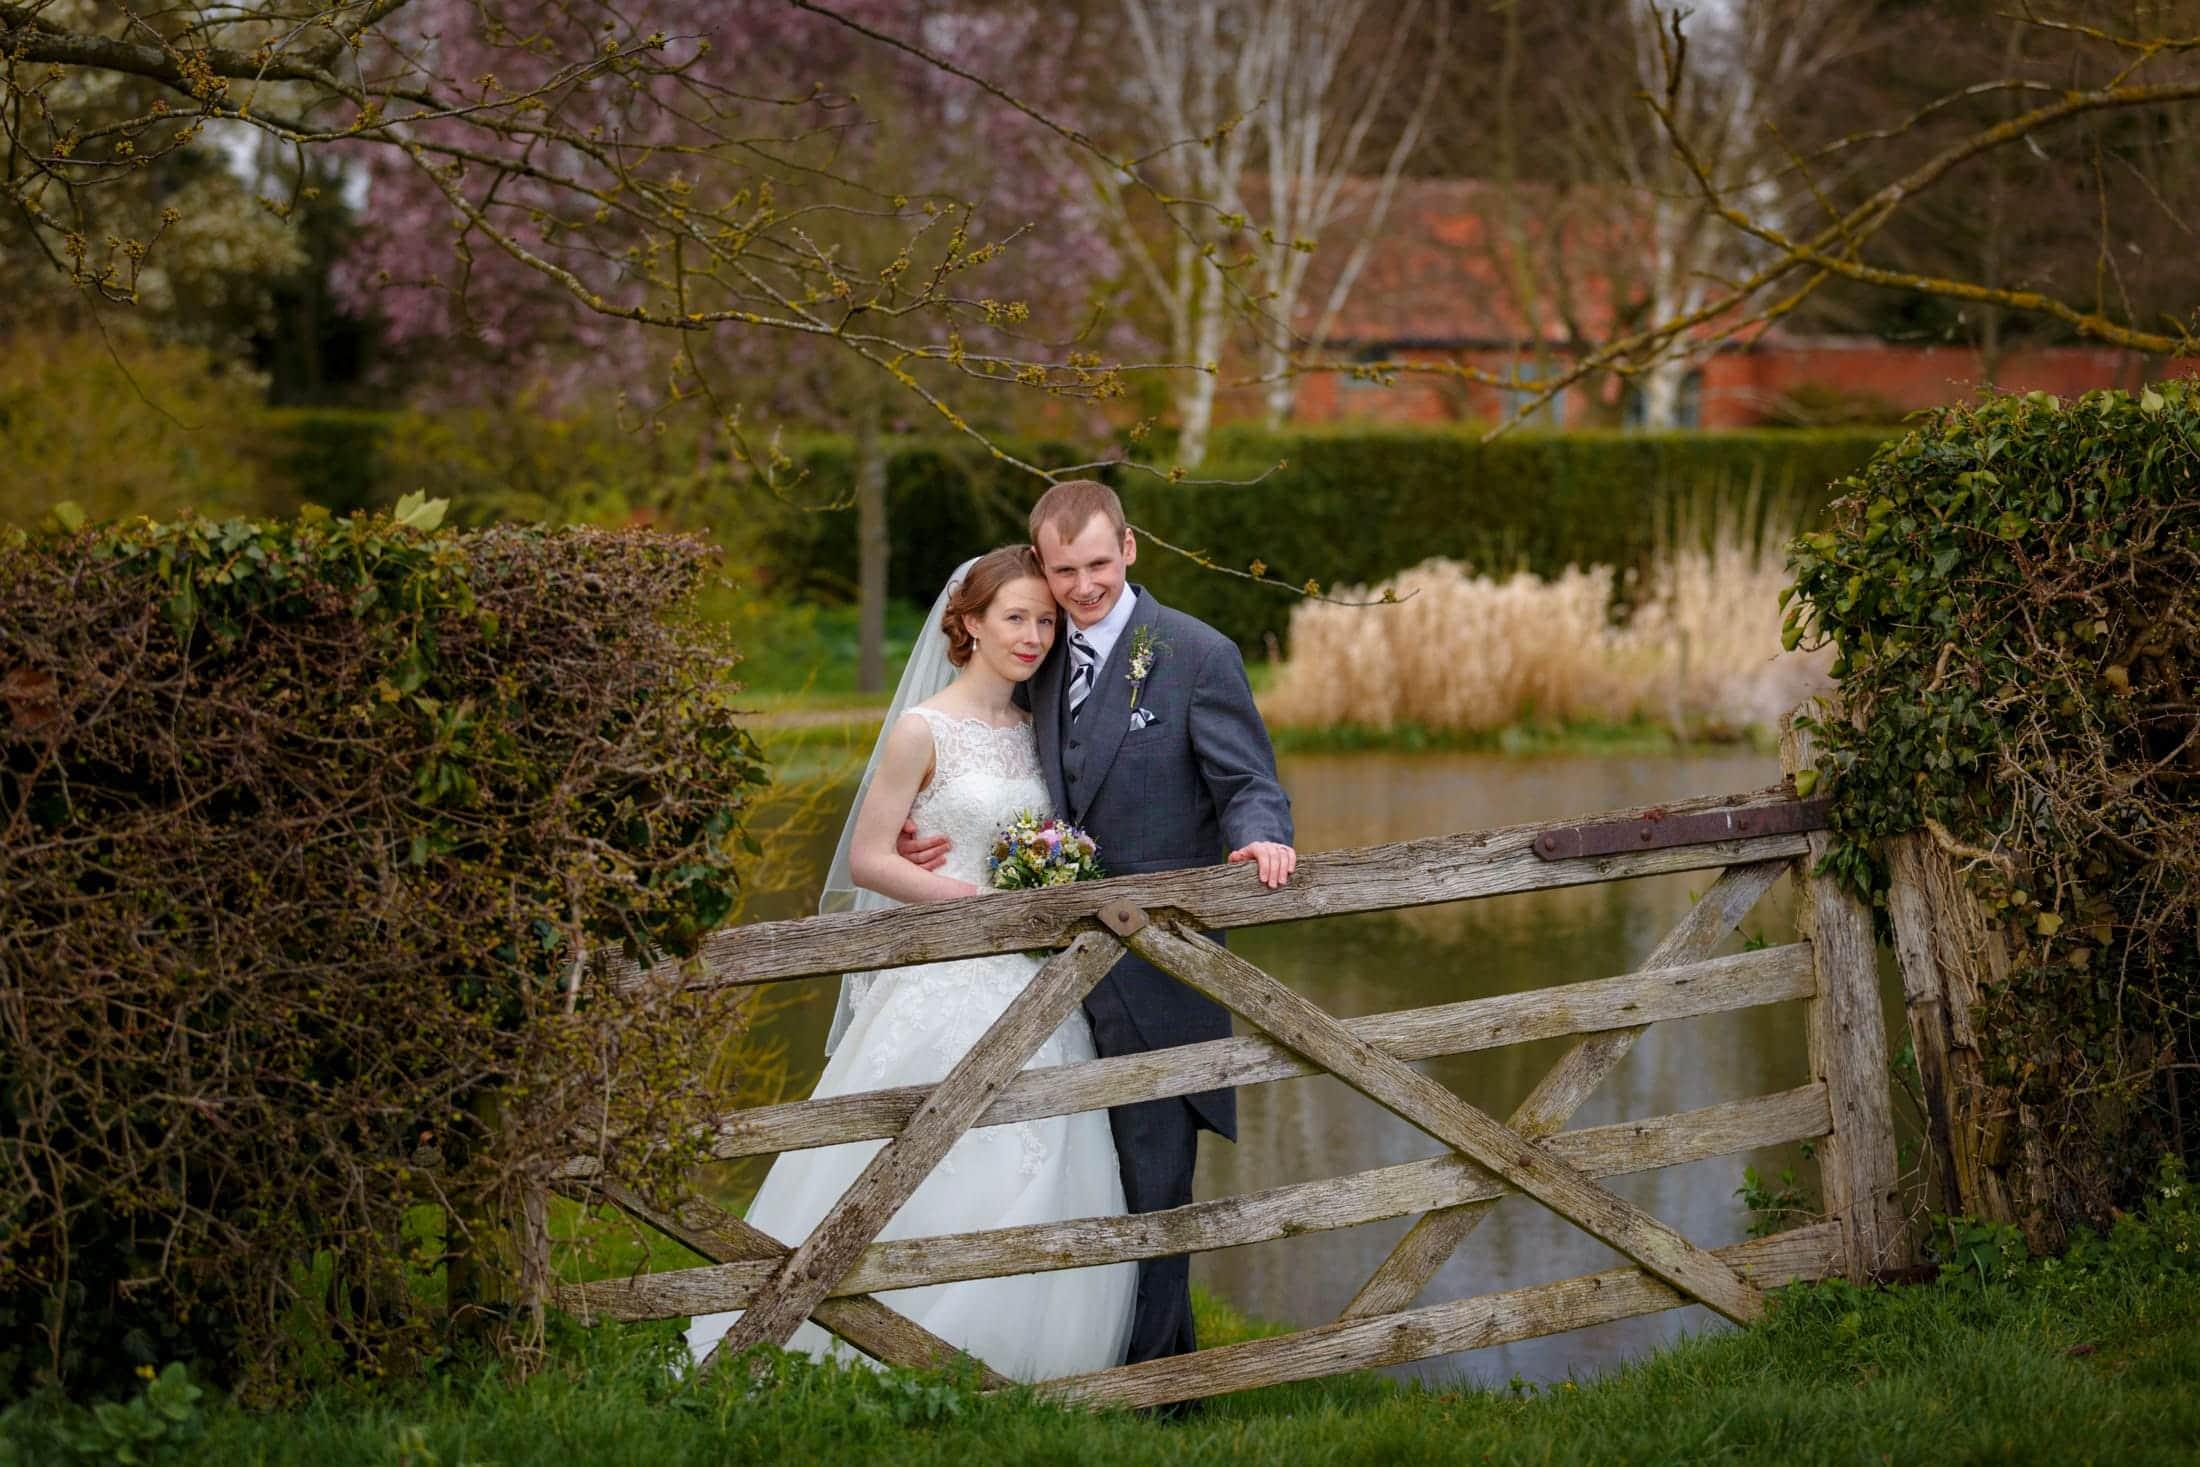 Granary Estates wedding photography of Rachel & Chris